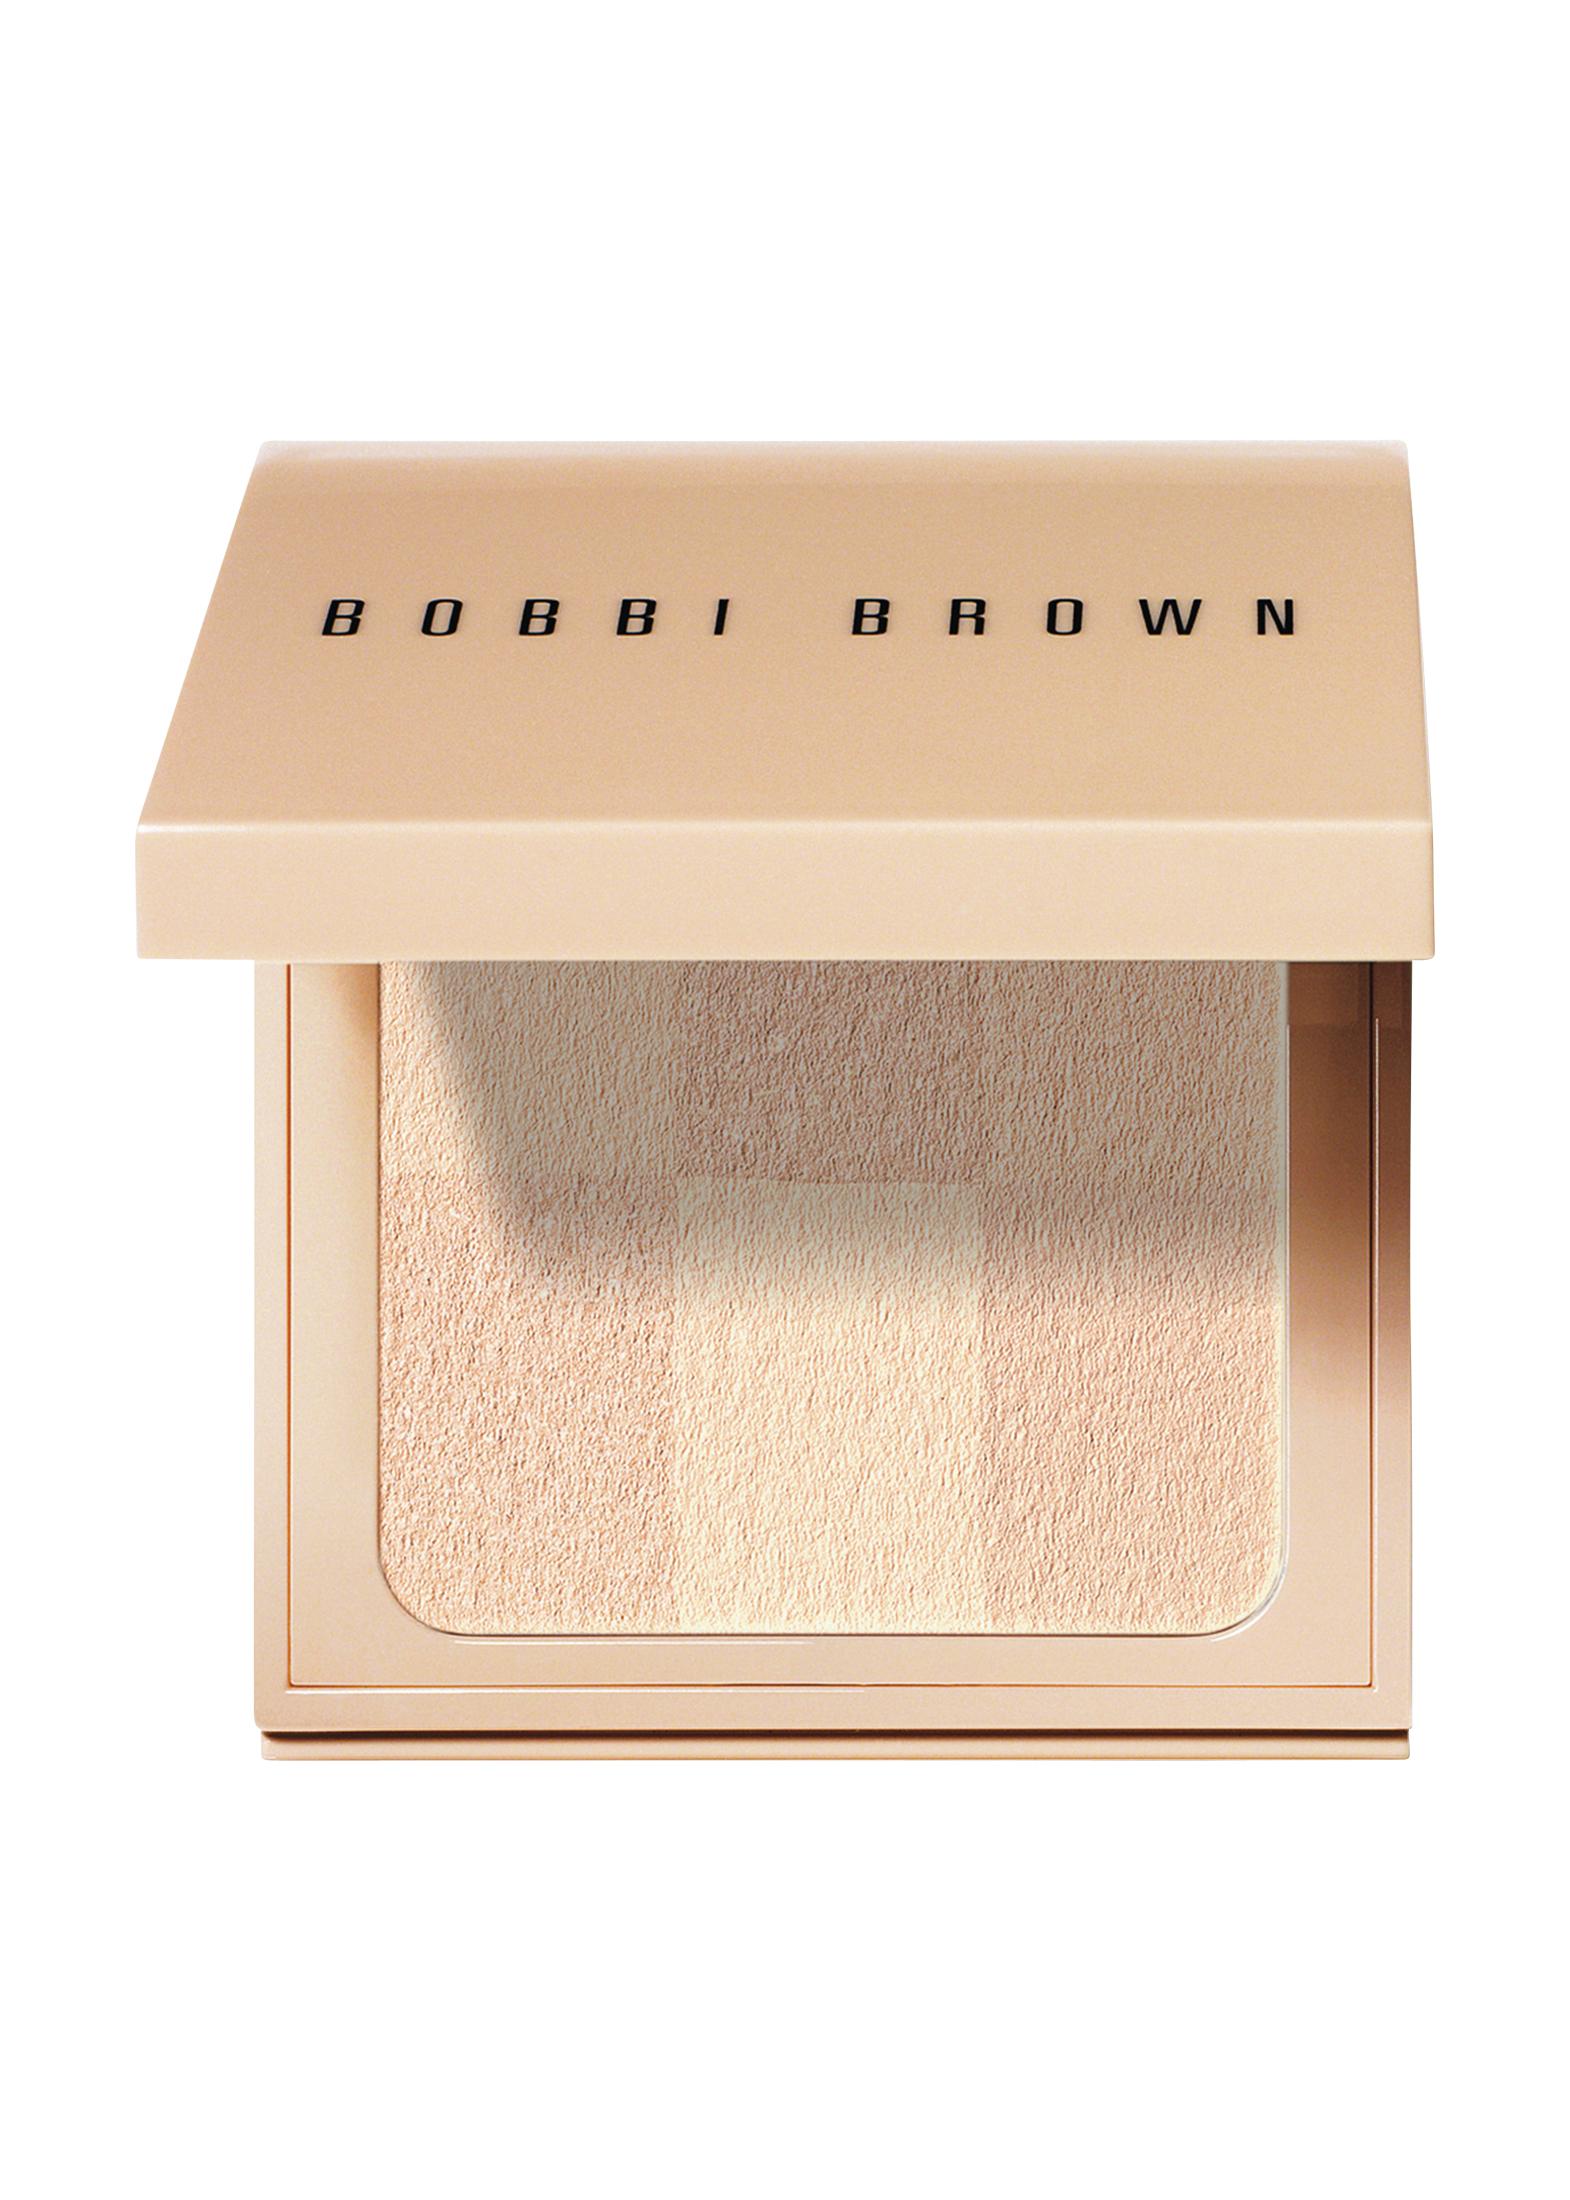 Bobbi Brown, Nude Finish Illuminating Powder Bare image number 0